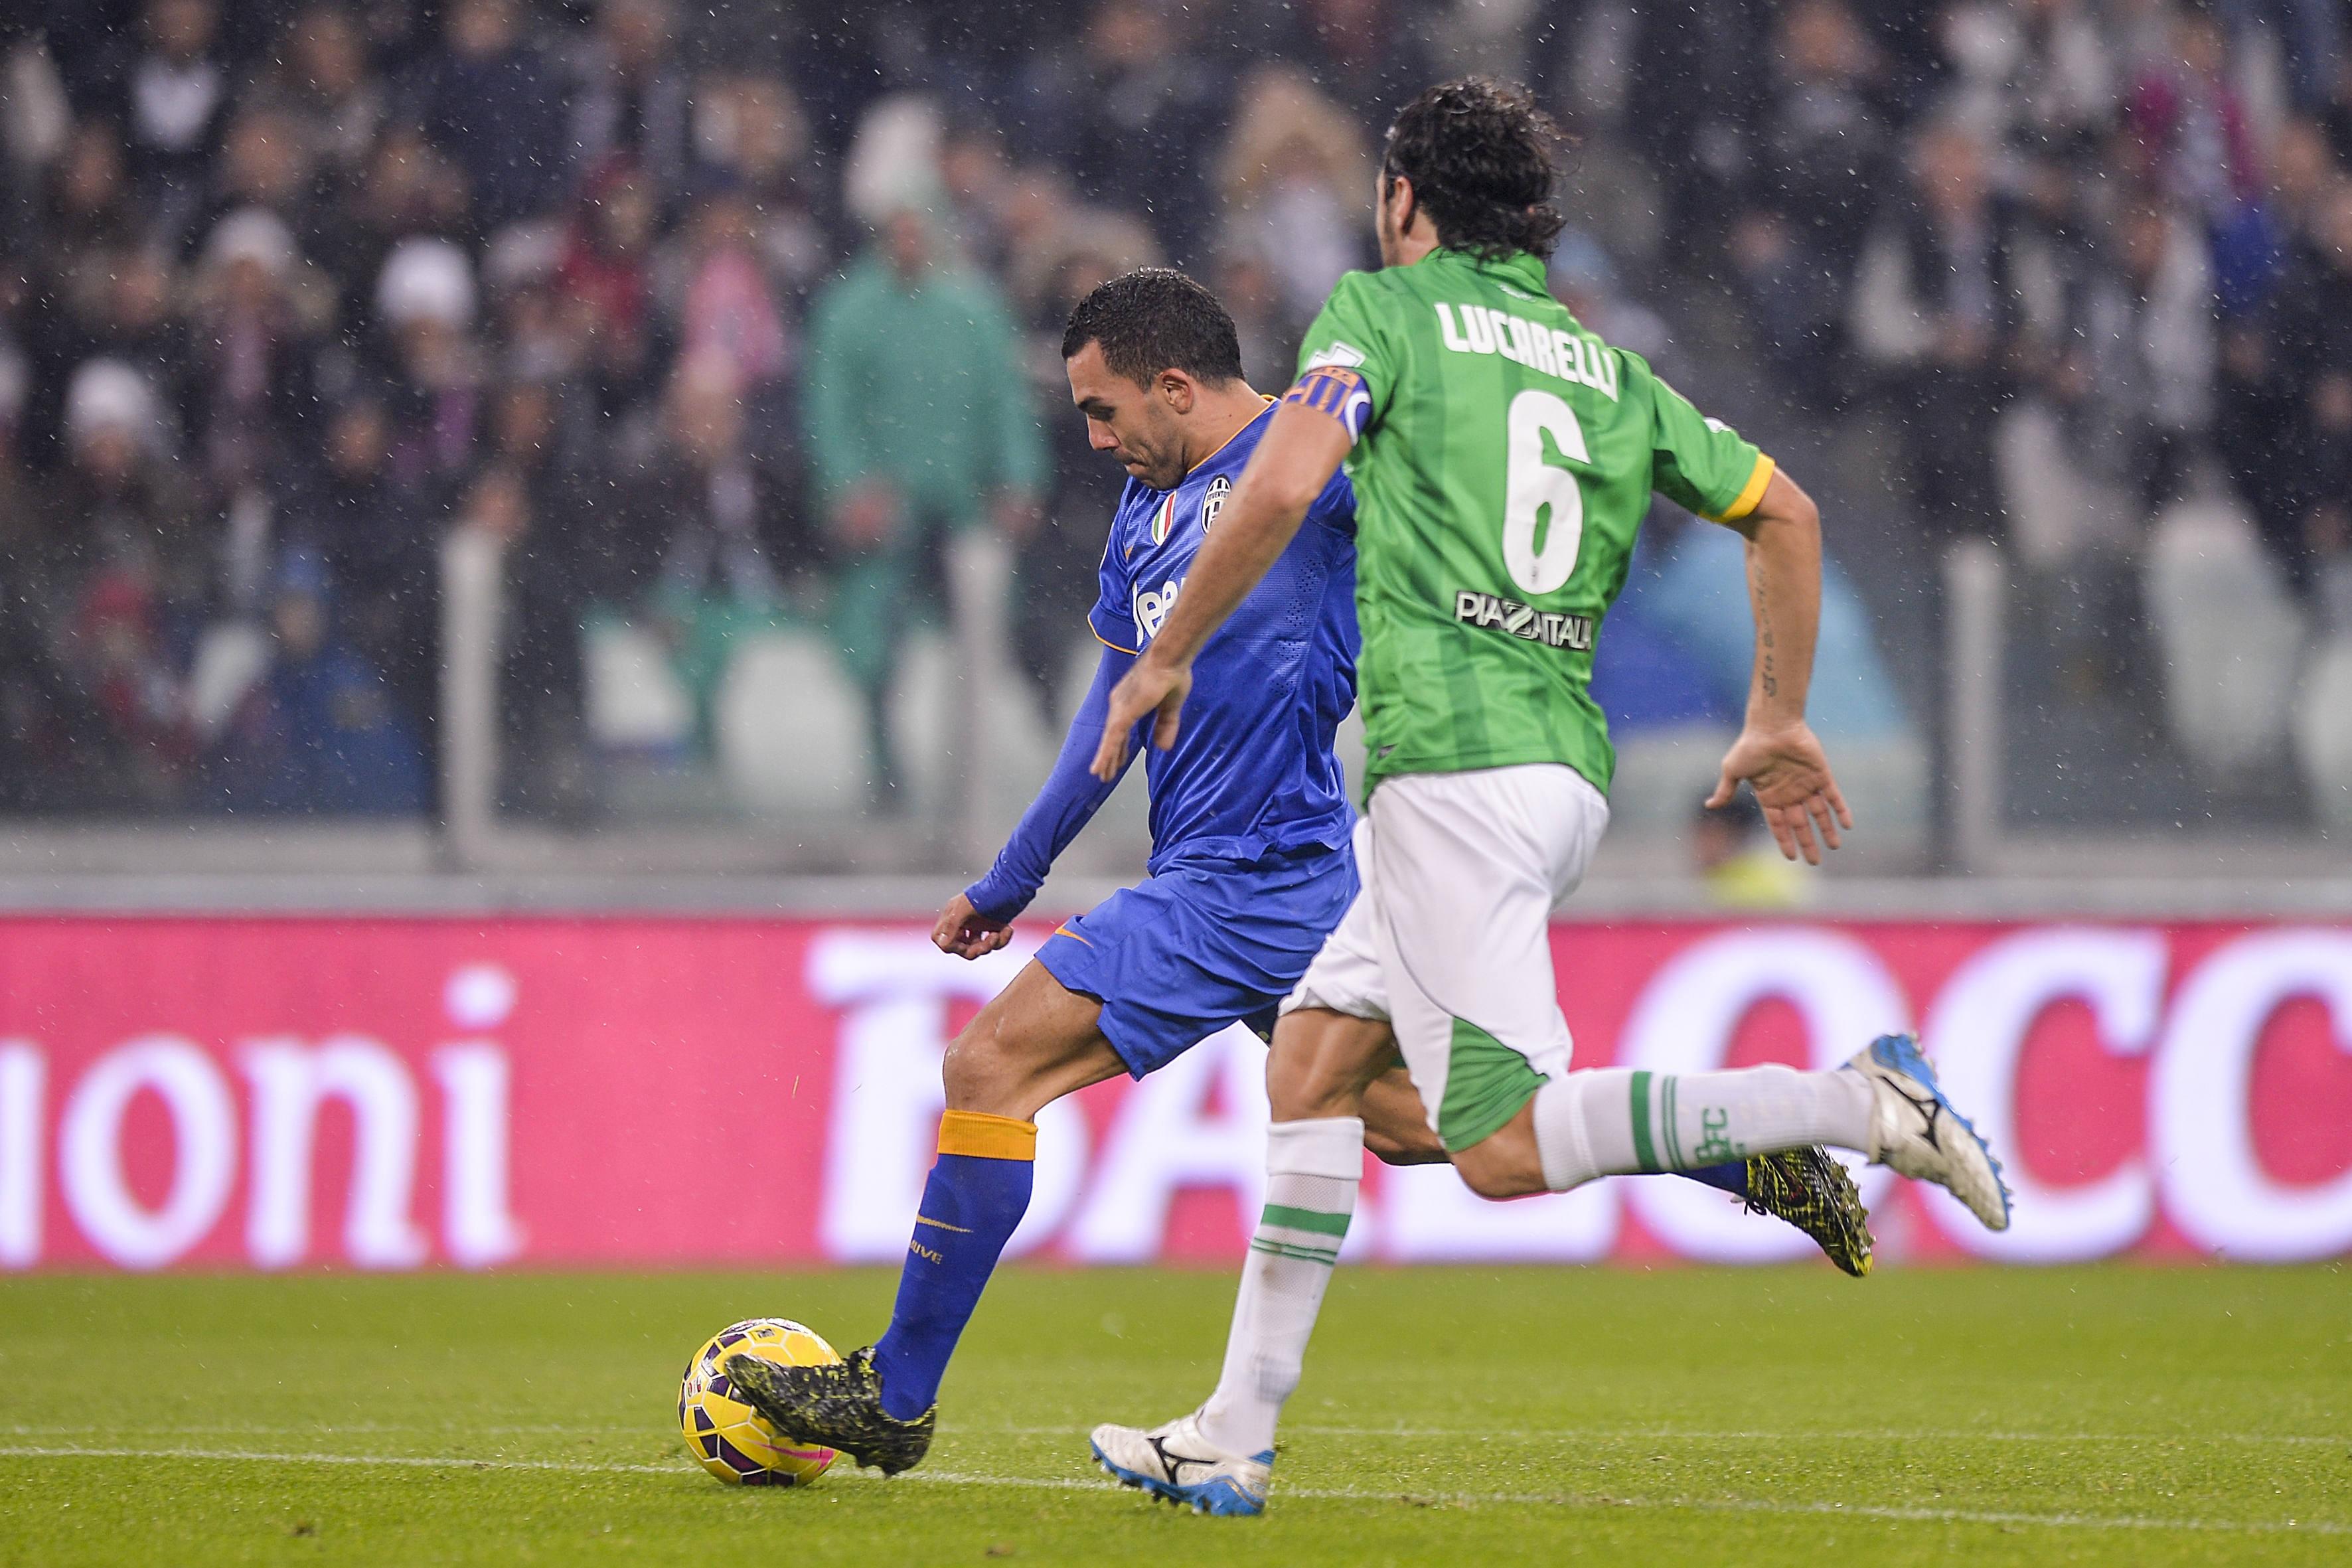 Sampdoria - Parma maçı istatistikleri 30